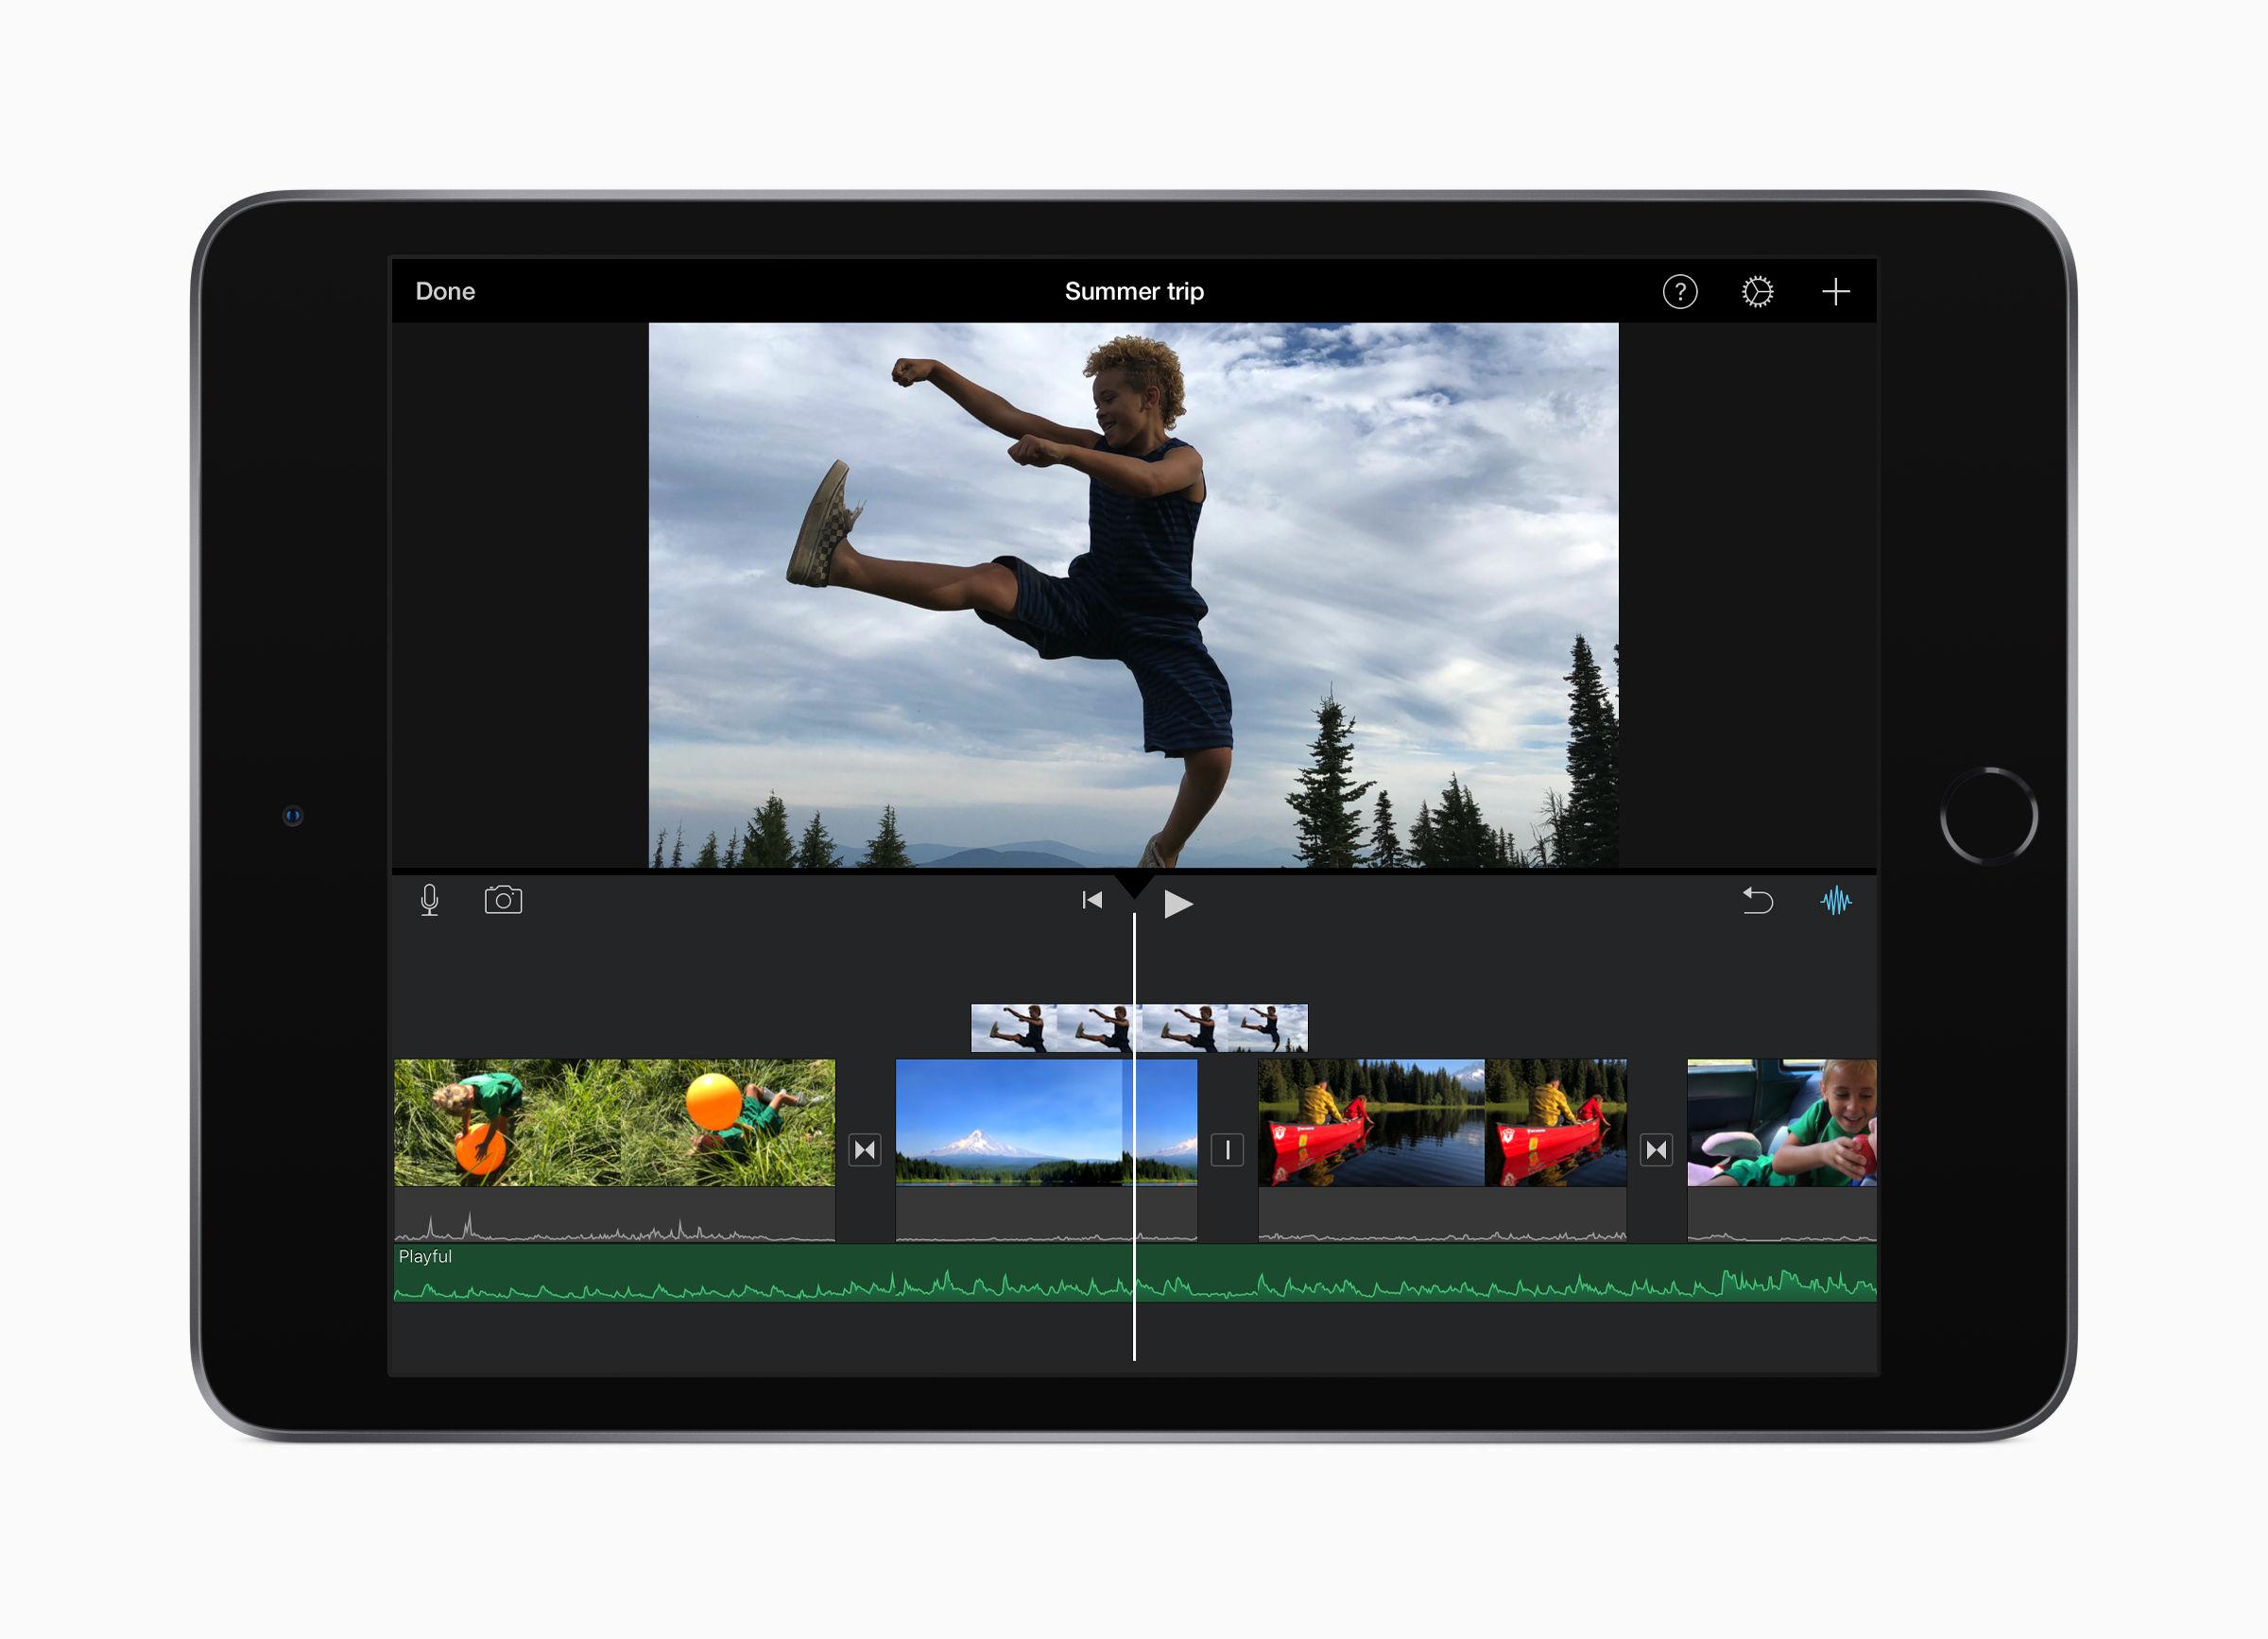 Ipad Air 2019 Vs Ipad Mini 2019 Vs Ipad Pro 2018 Vs